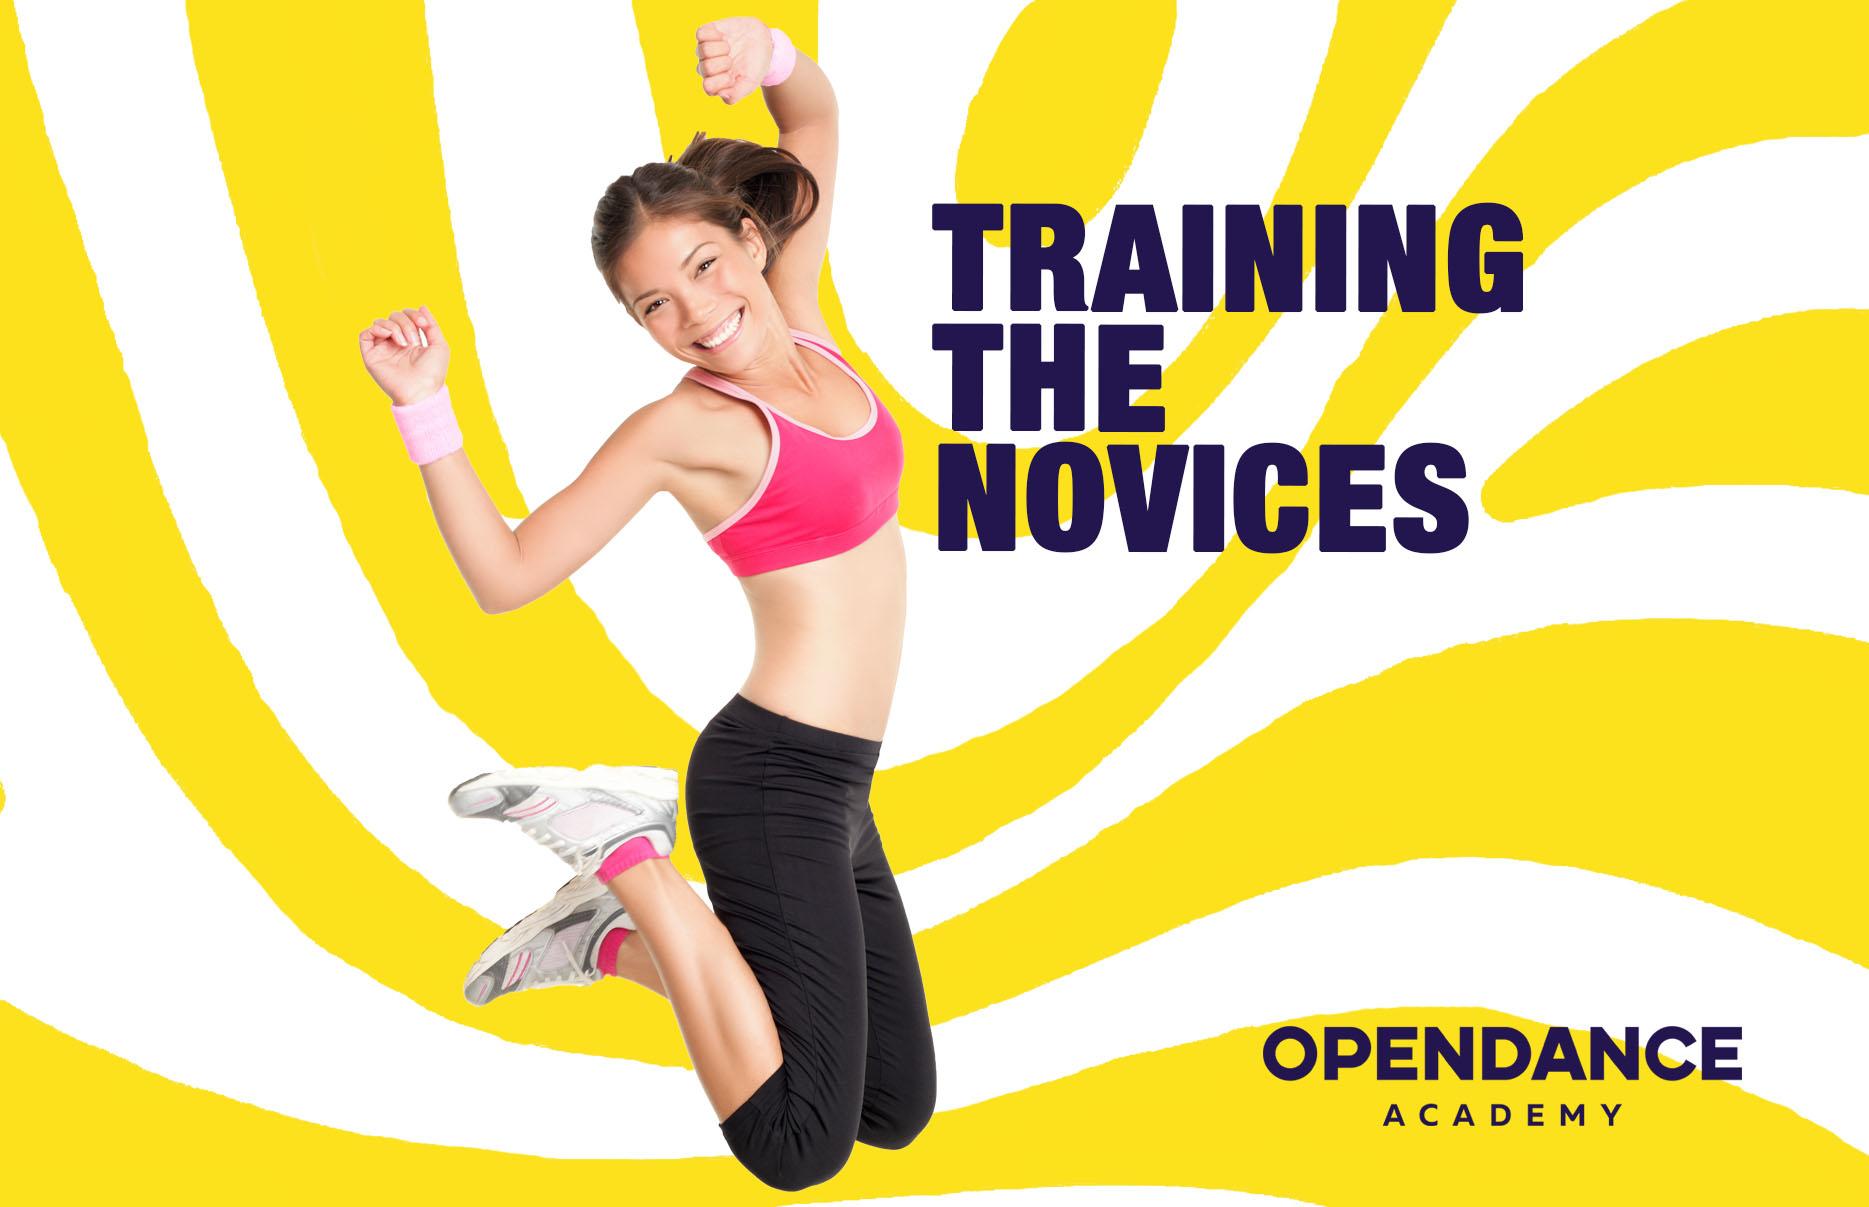 Training The Novices